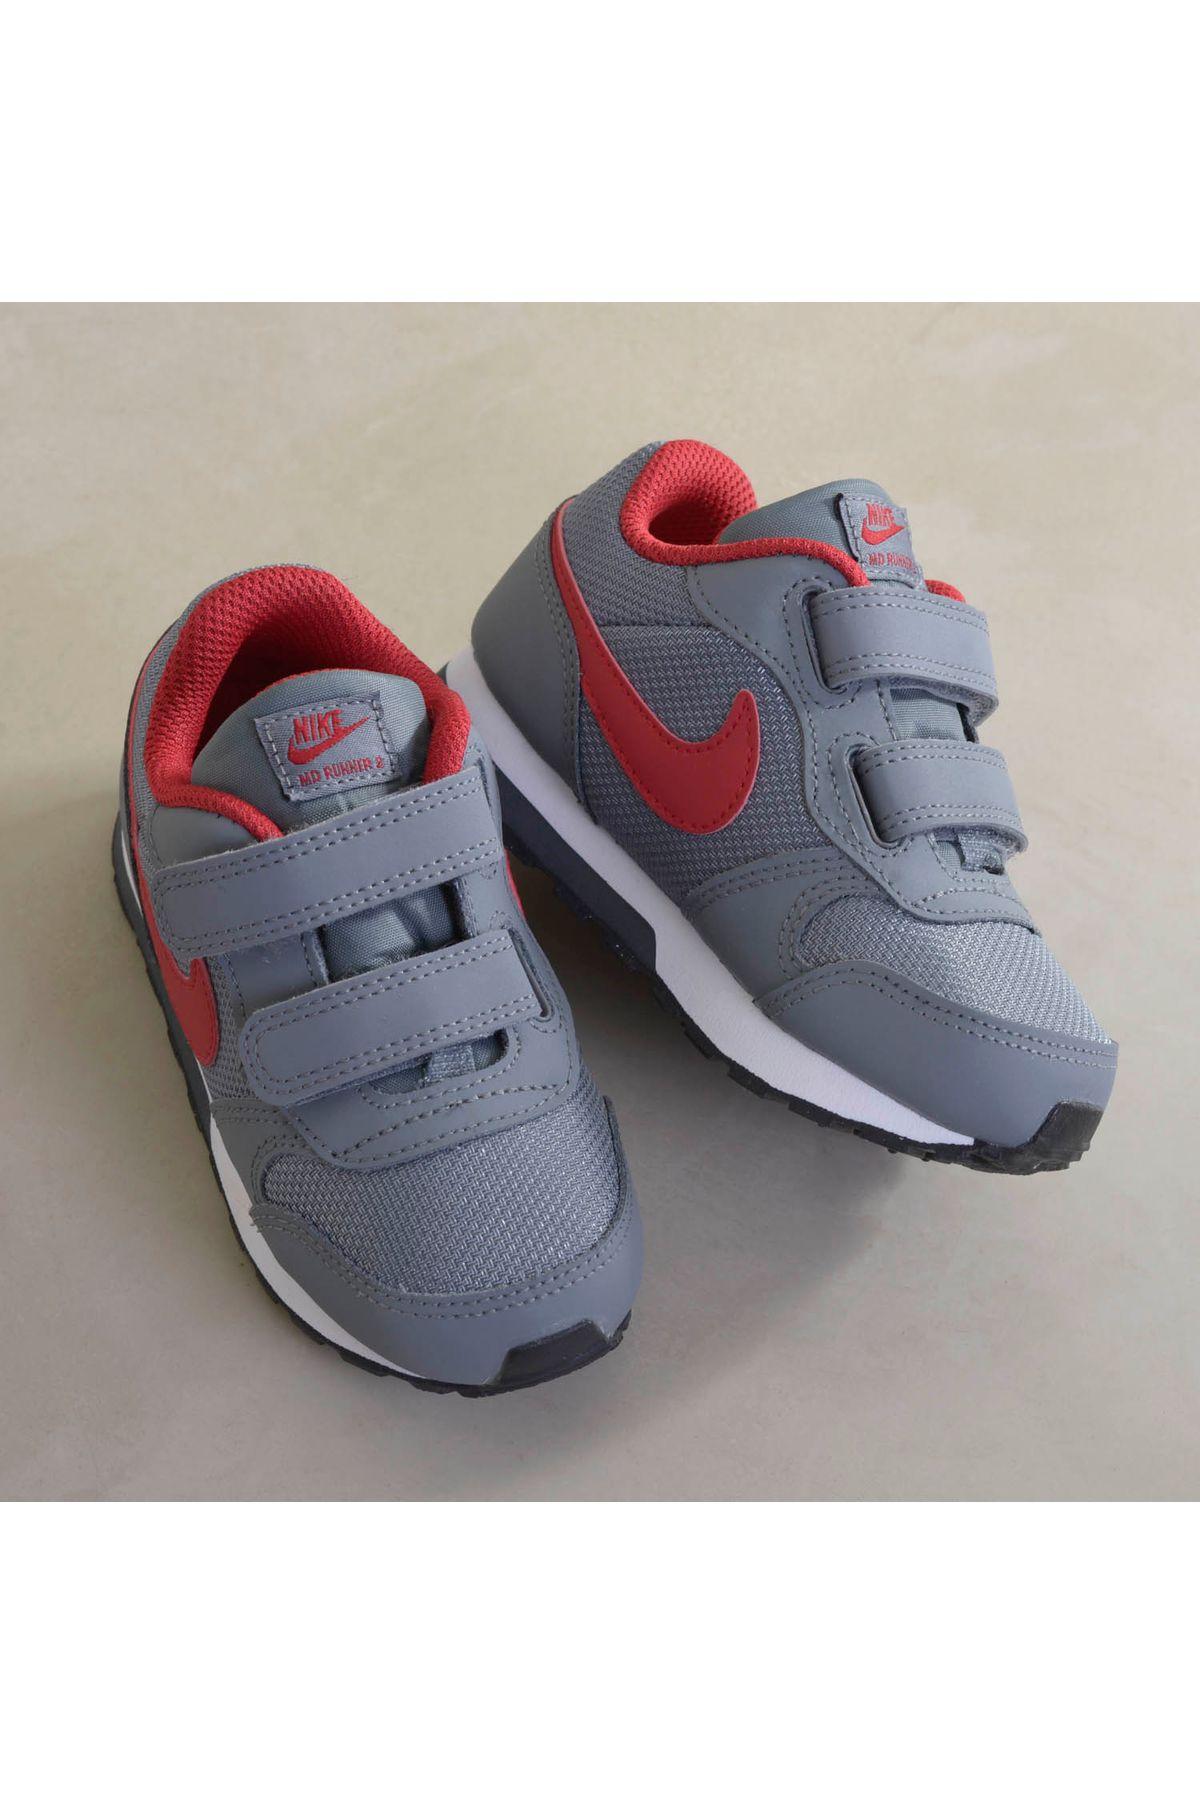 eab6cc51cb64a Tênis Infantil Nike Runner 2 | Mundial Calçados - Mundial Calçados